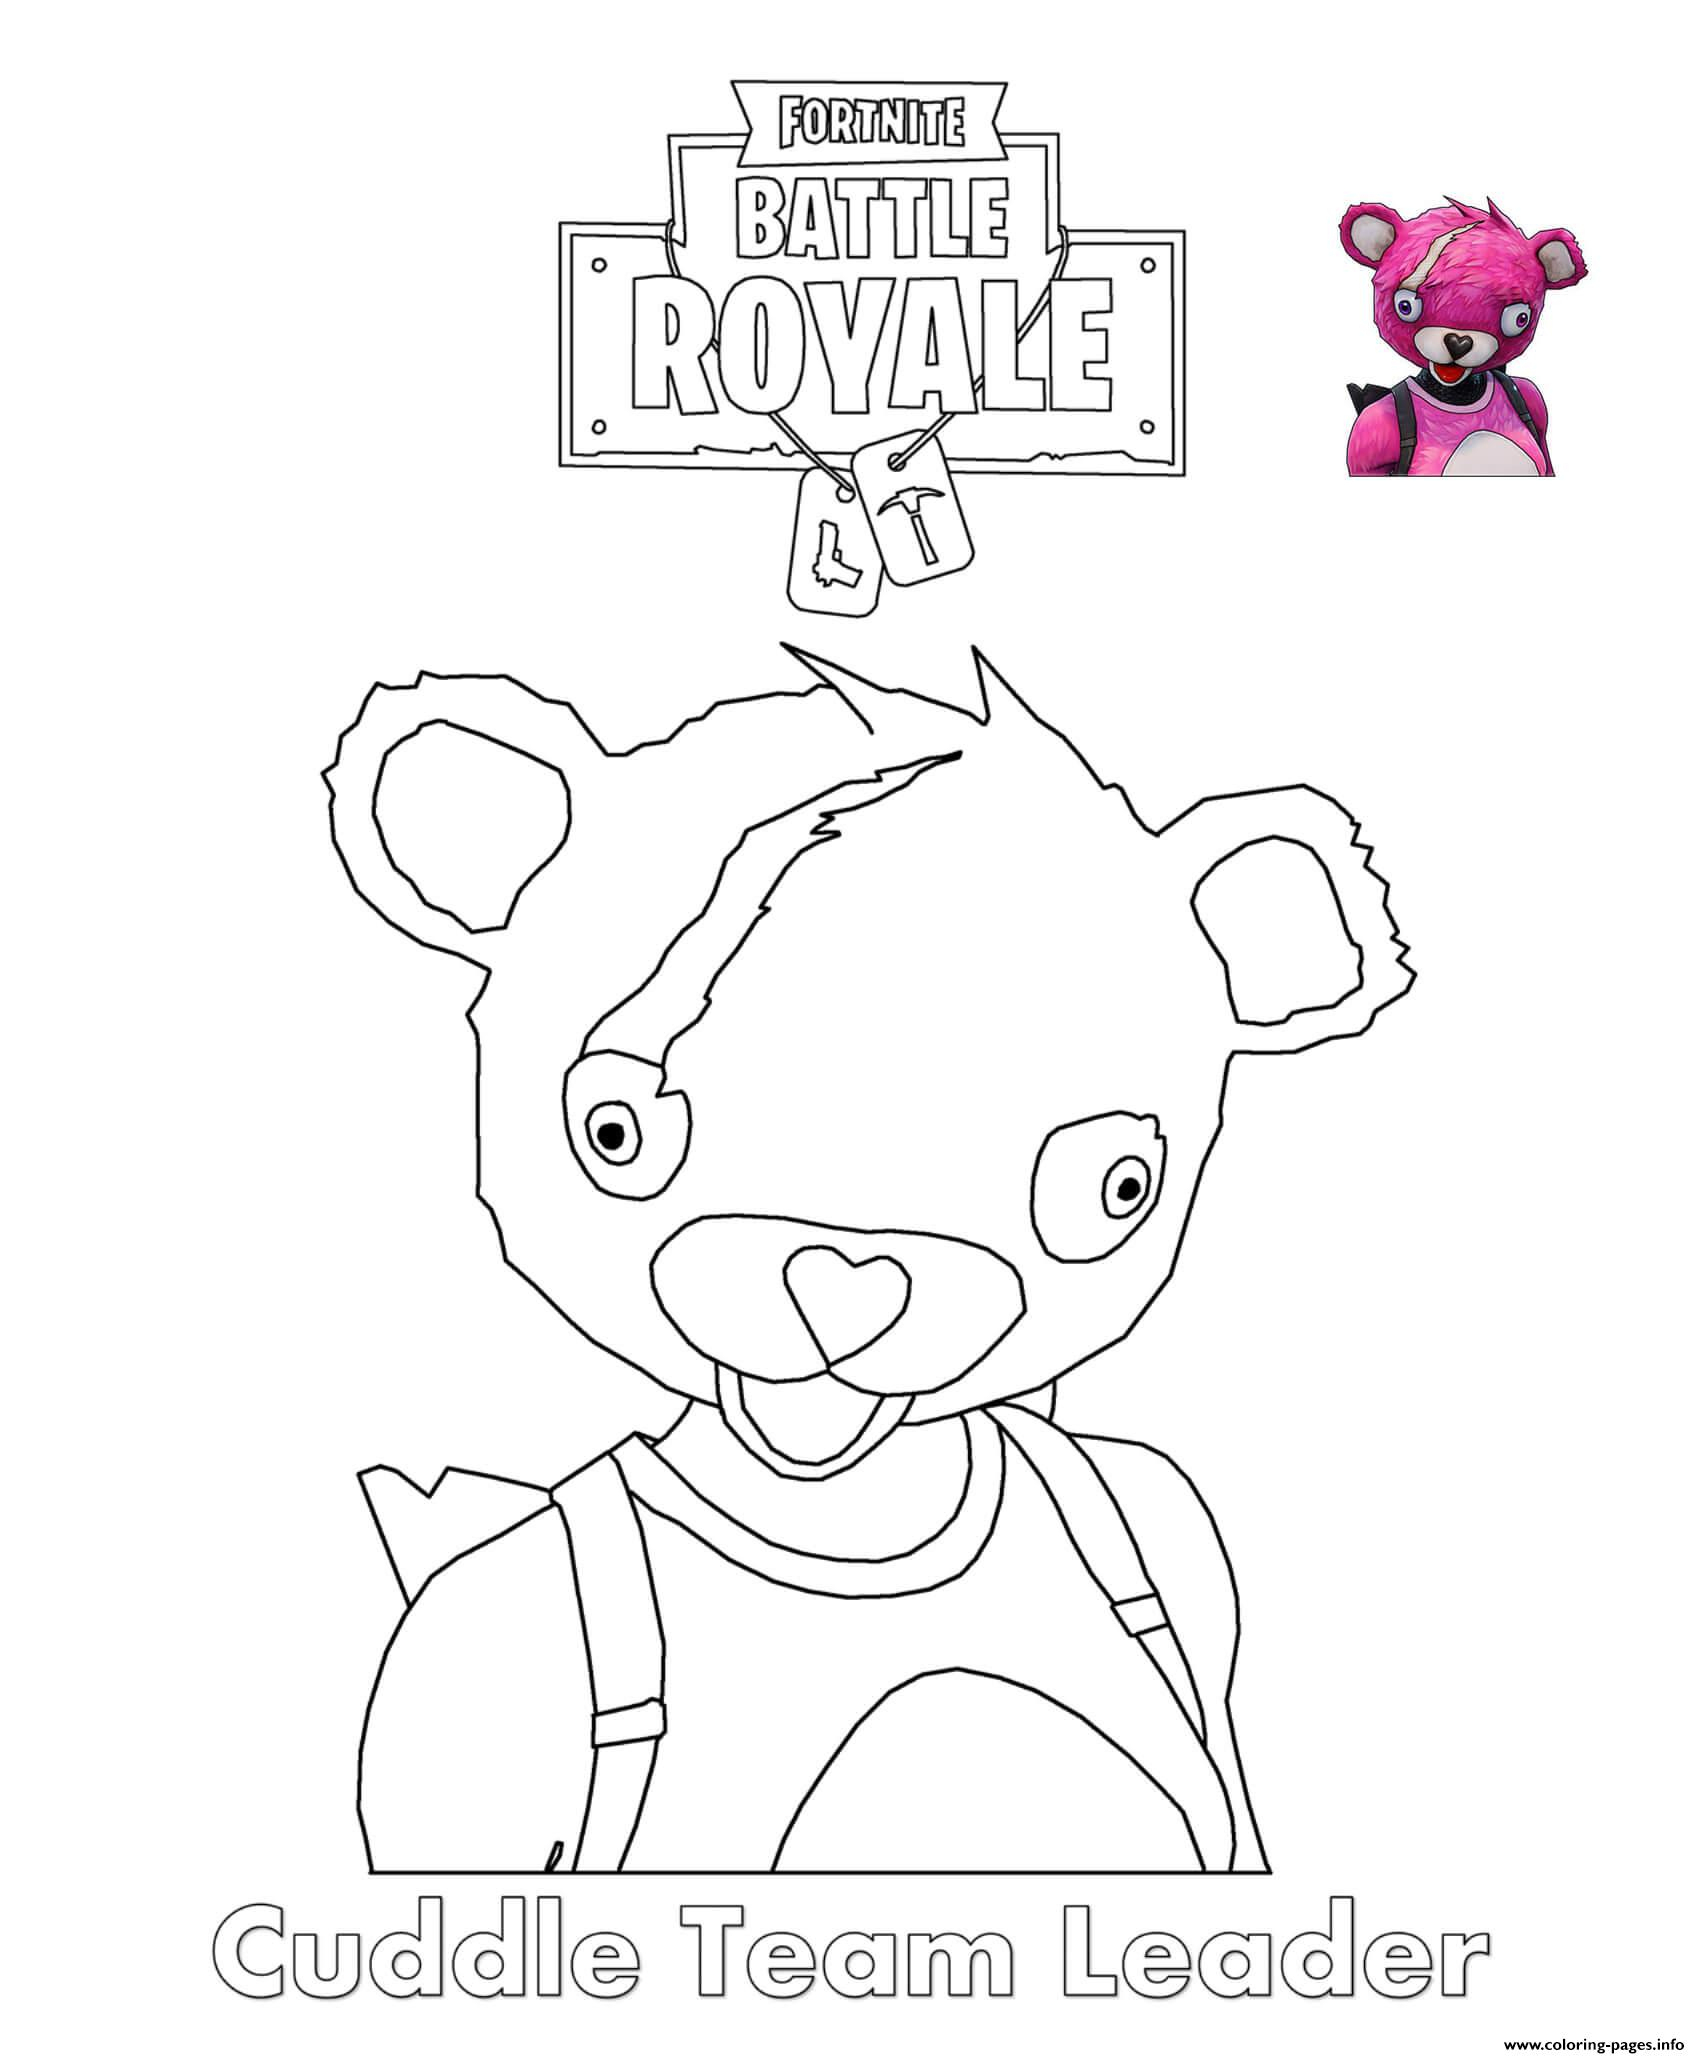 Cuddle Team Leader Fortnite Coloring Pages Printable serapportantà Dessin A Imprimer Personnage Fortnite